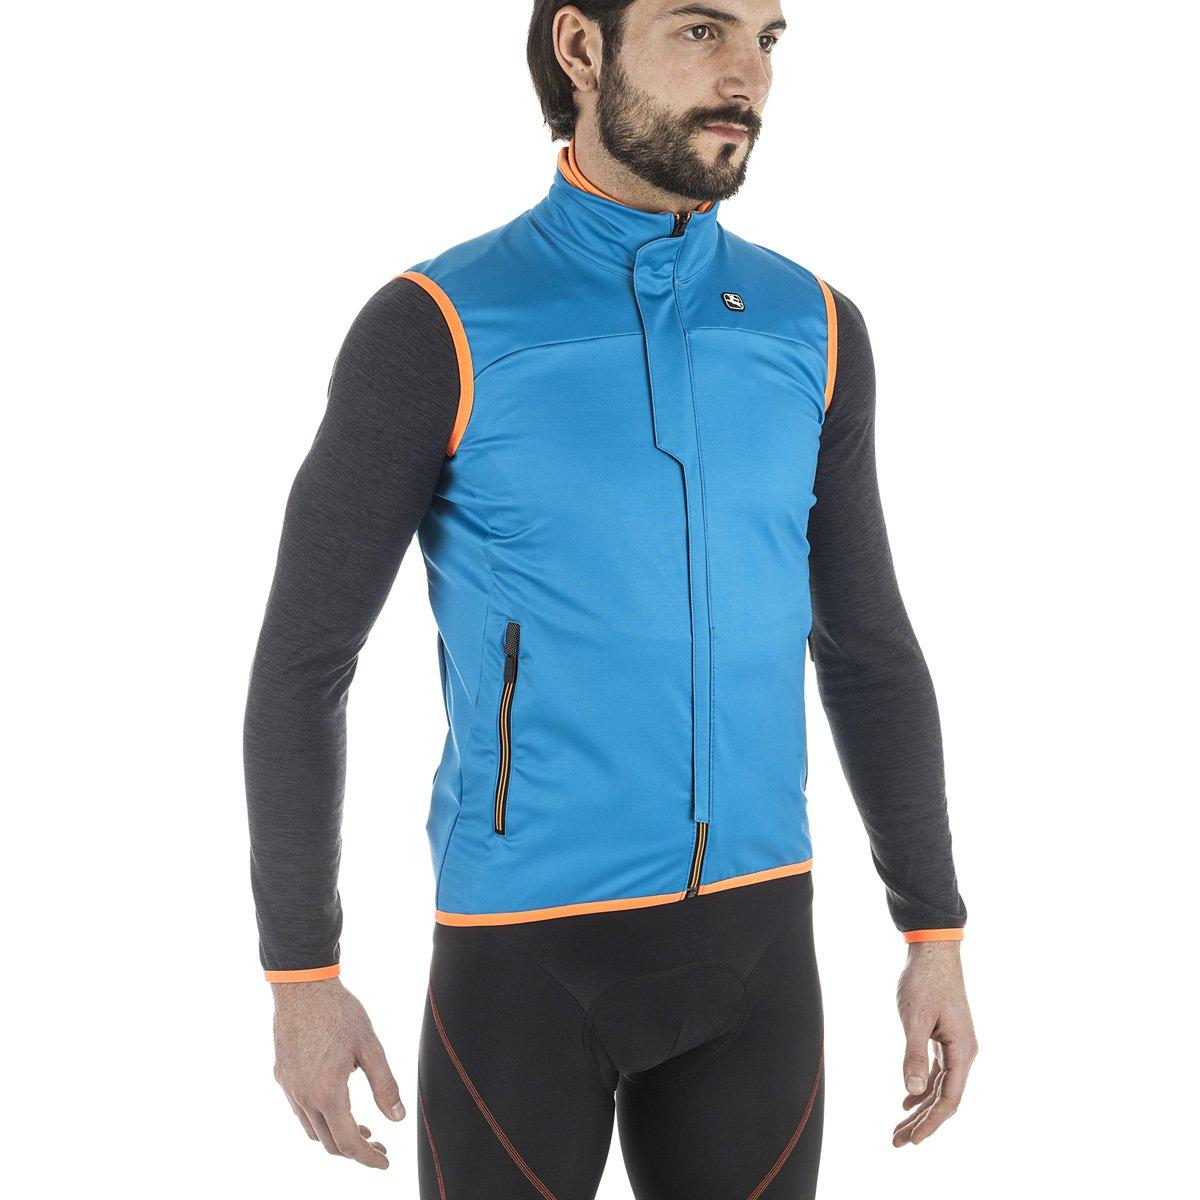 Giordana 2016 / 17メンズsostaサイクリングベスト – gicw16-vest-sost B01MA43ZVW X-Large|Aqua/Orange Aqua/Orange X-Large